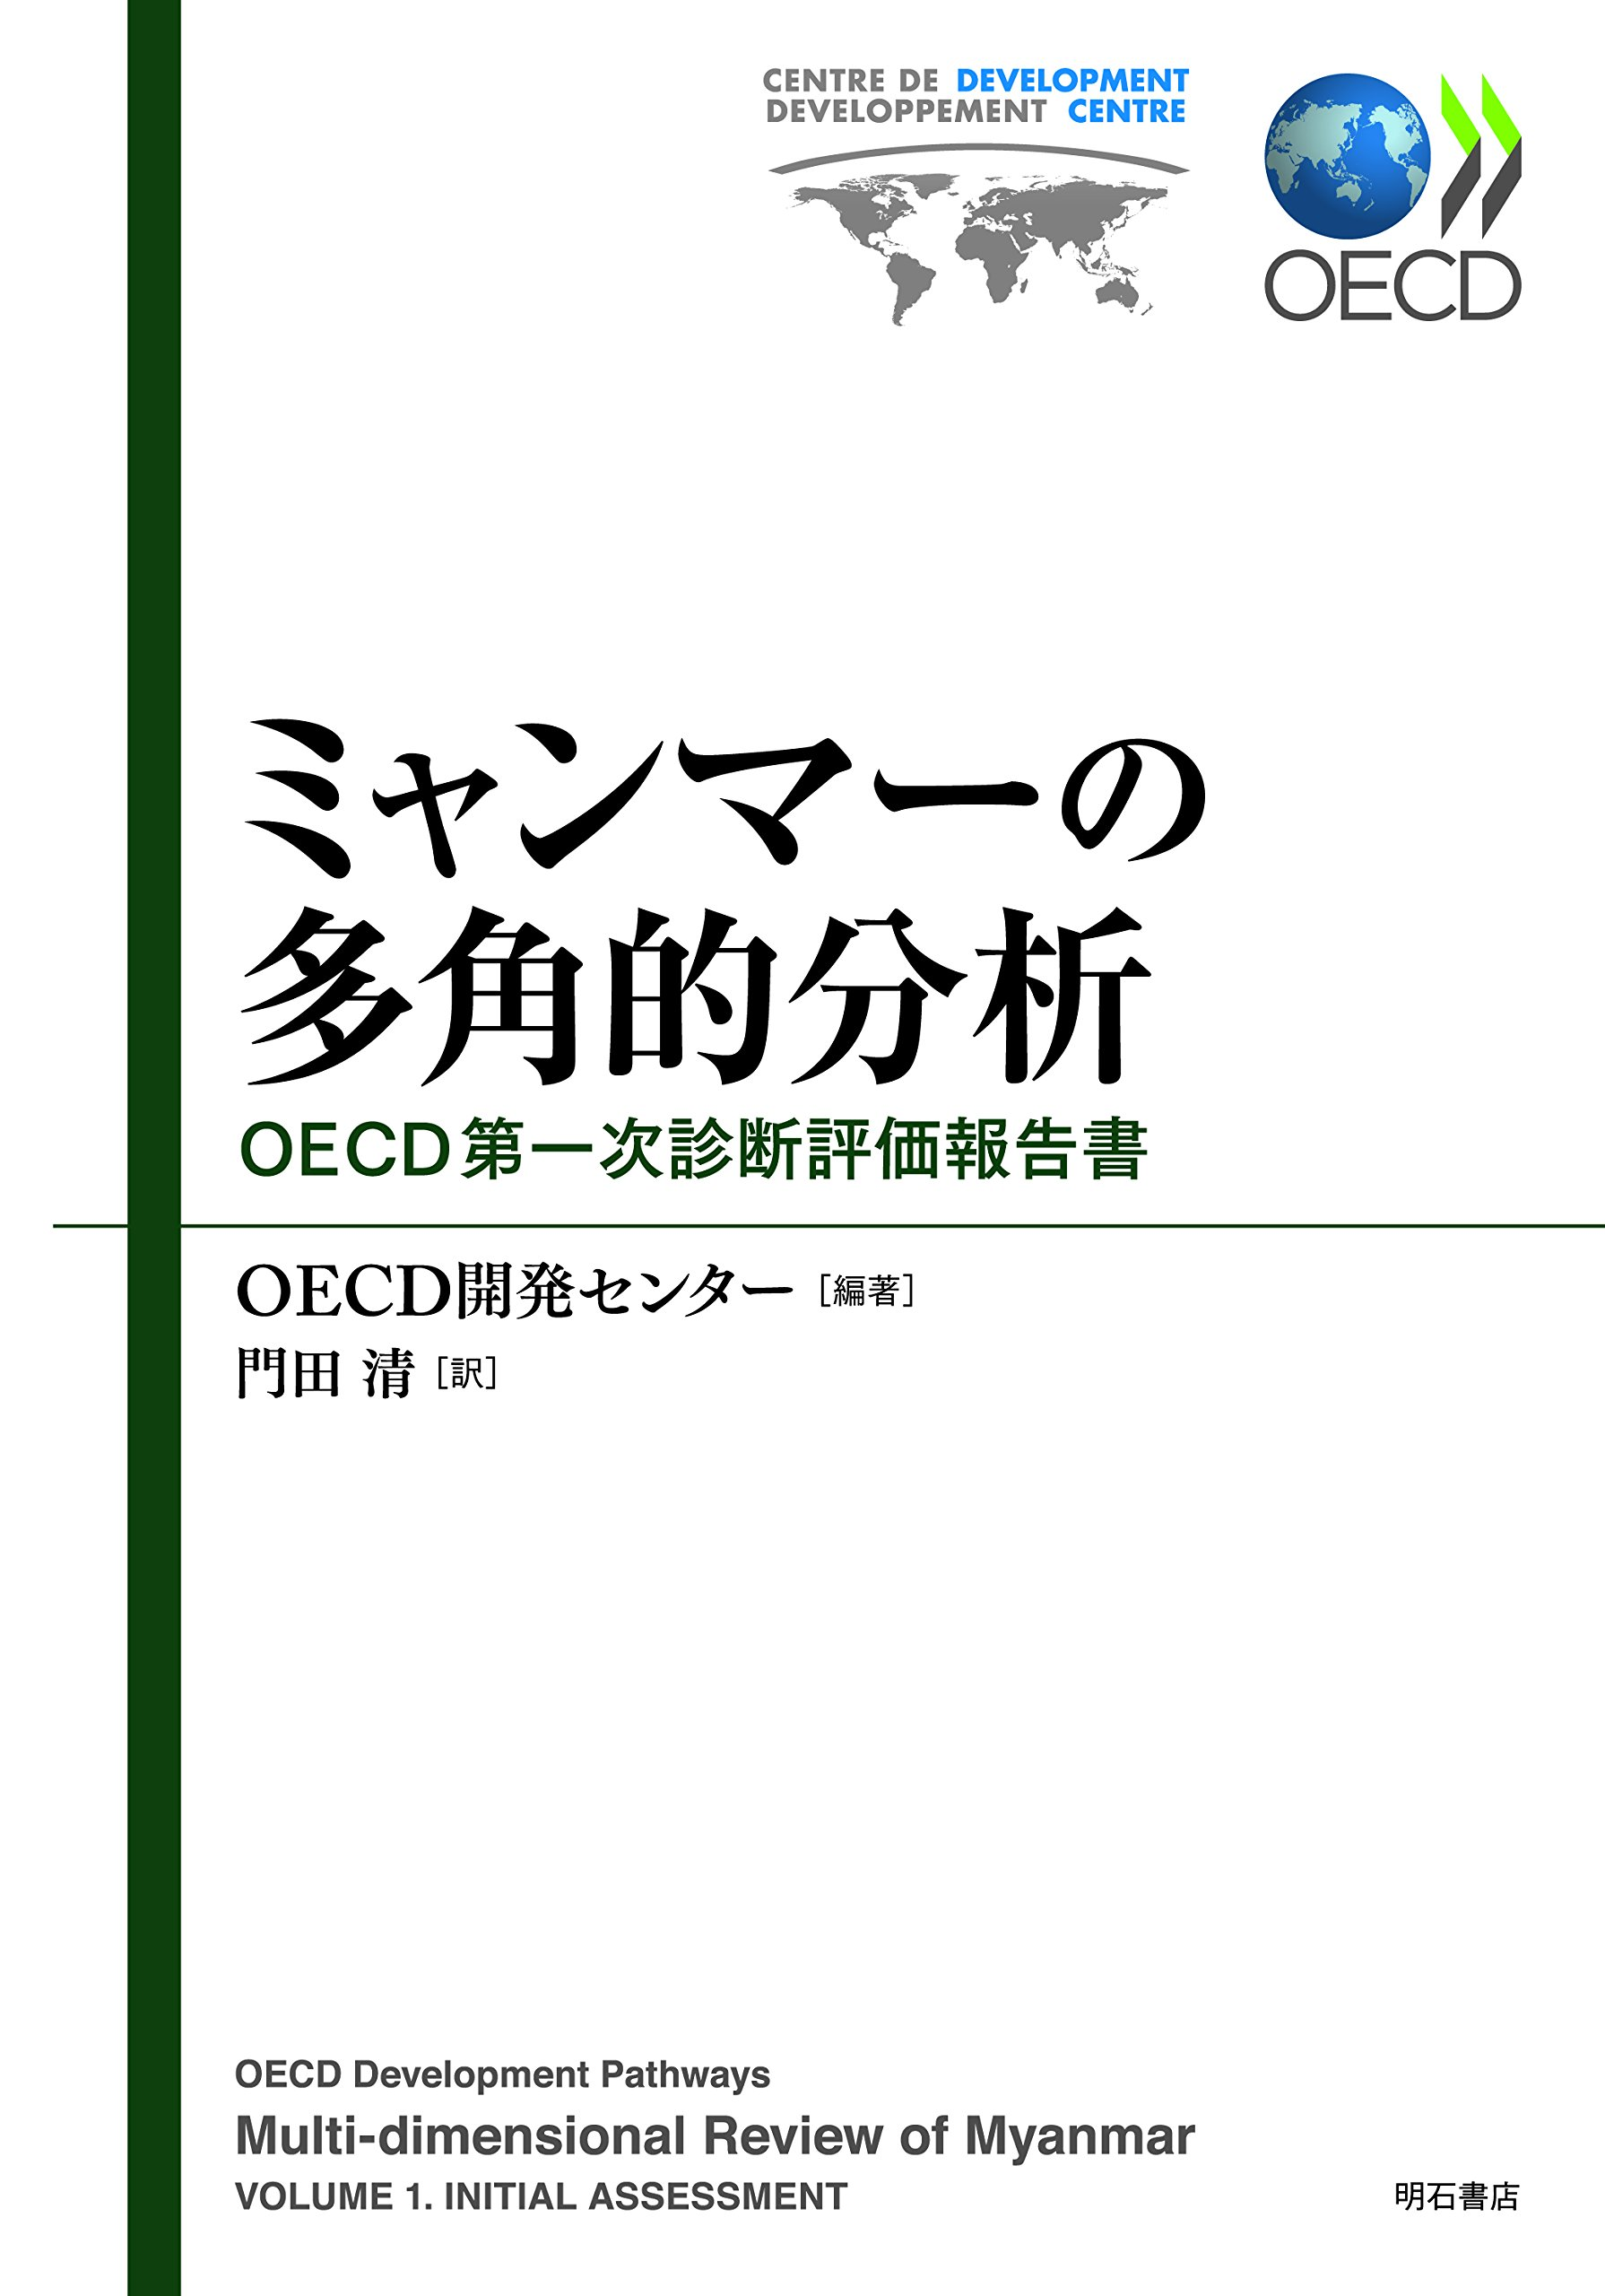 OECD開発センター編著、門田 清(東京国際大学)著 『ミャンマーの多角的分析―OECD第一次診断評価報告書』